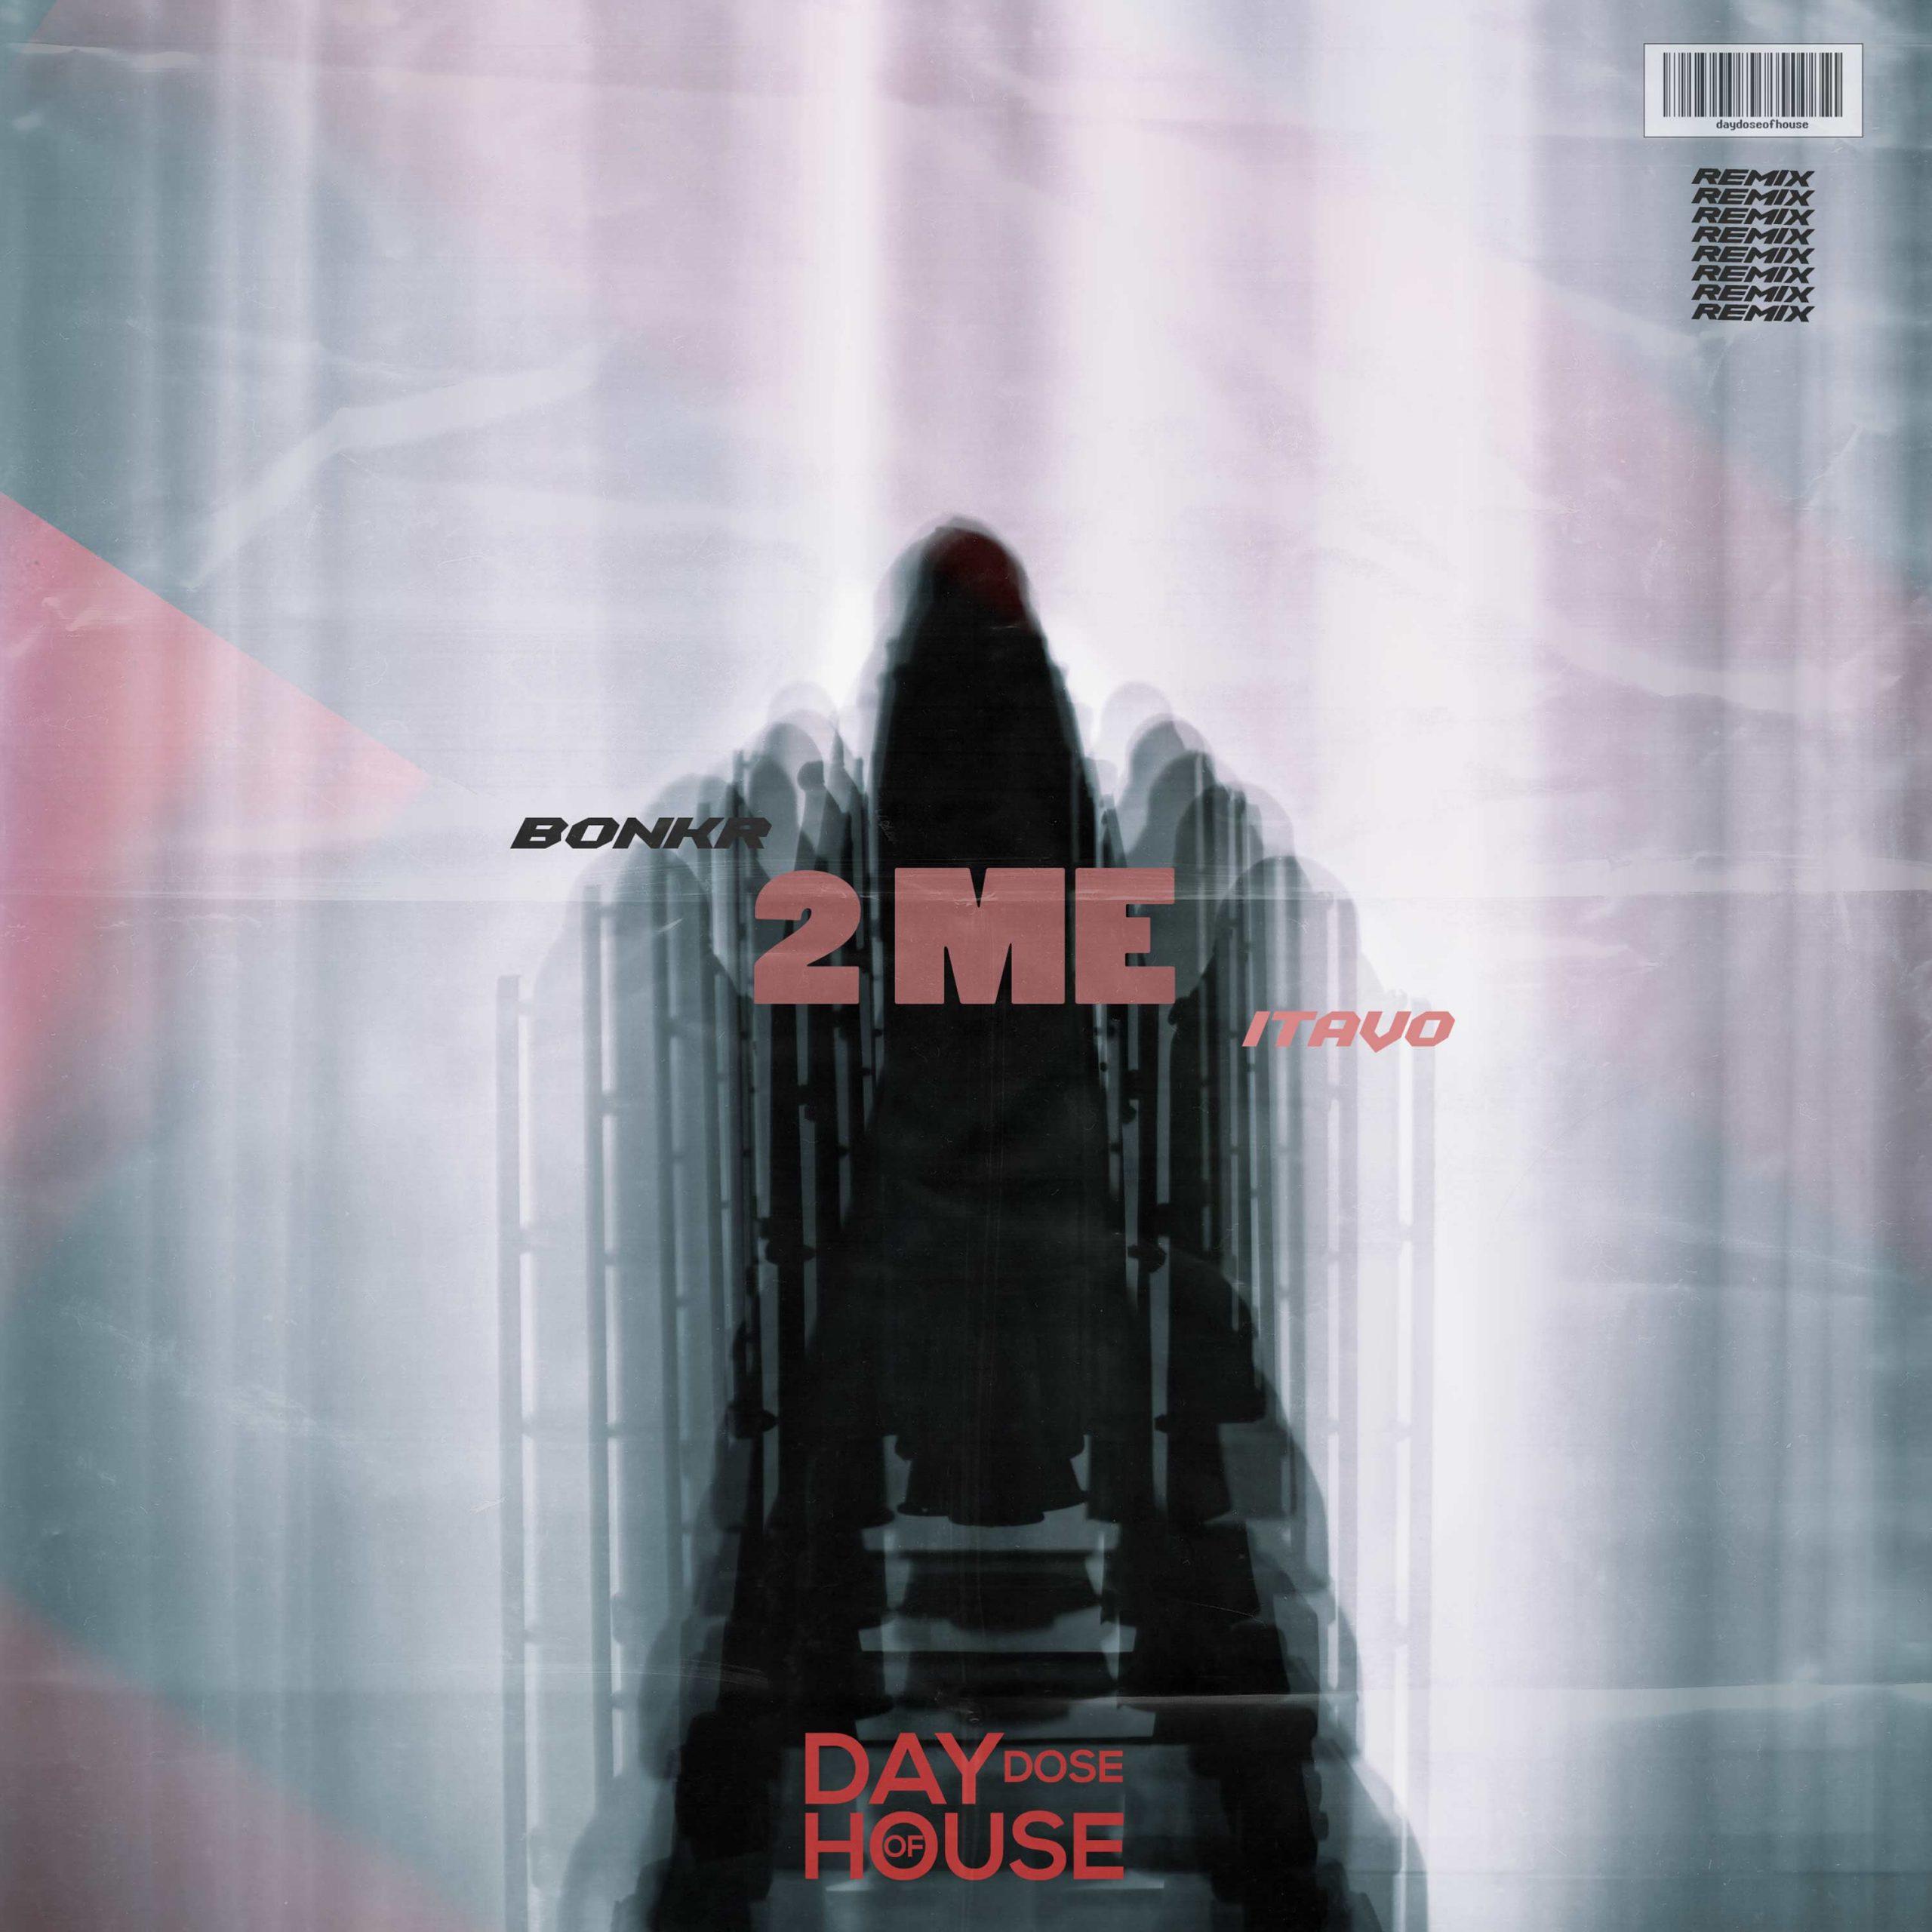 Bonkr - 2 Me (iTavo Remix)